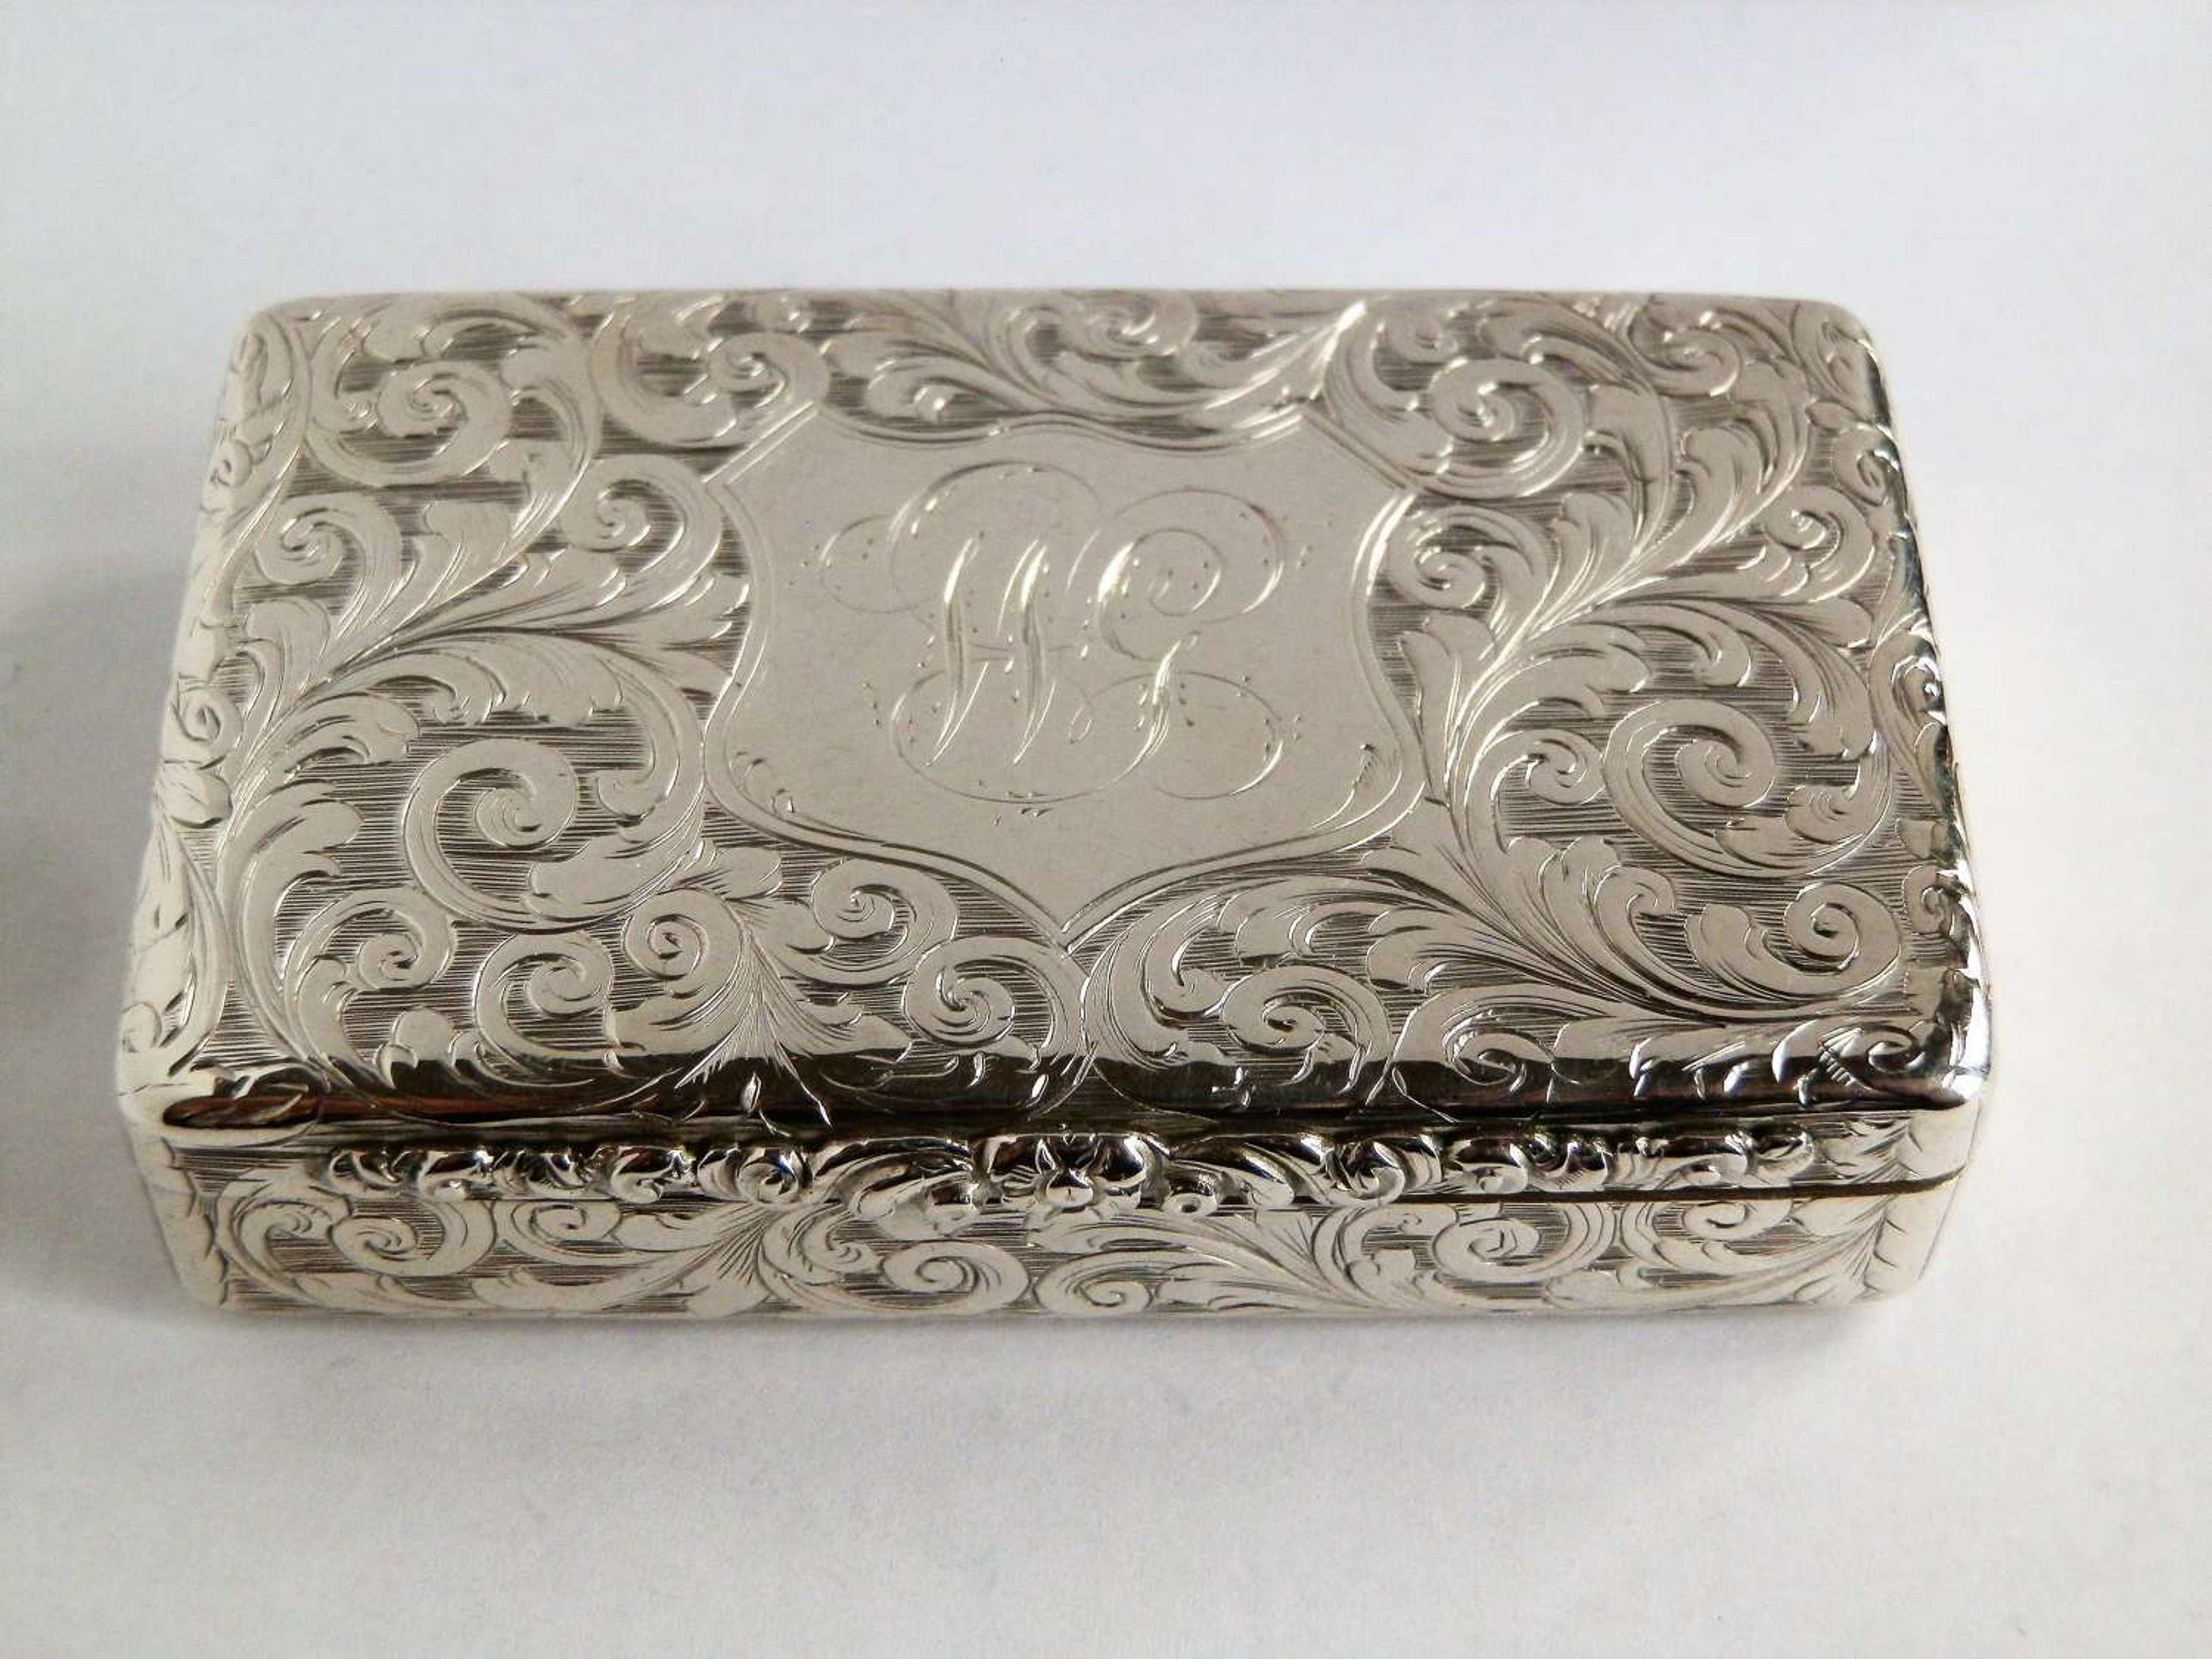 An early Victorian silver pocket snuff box, Edward Smith 1845.